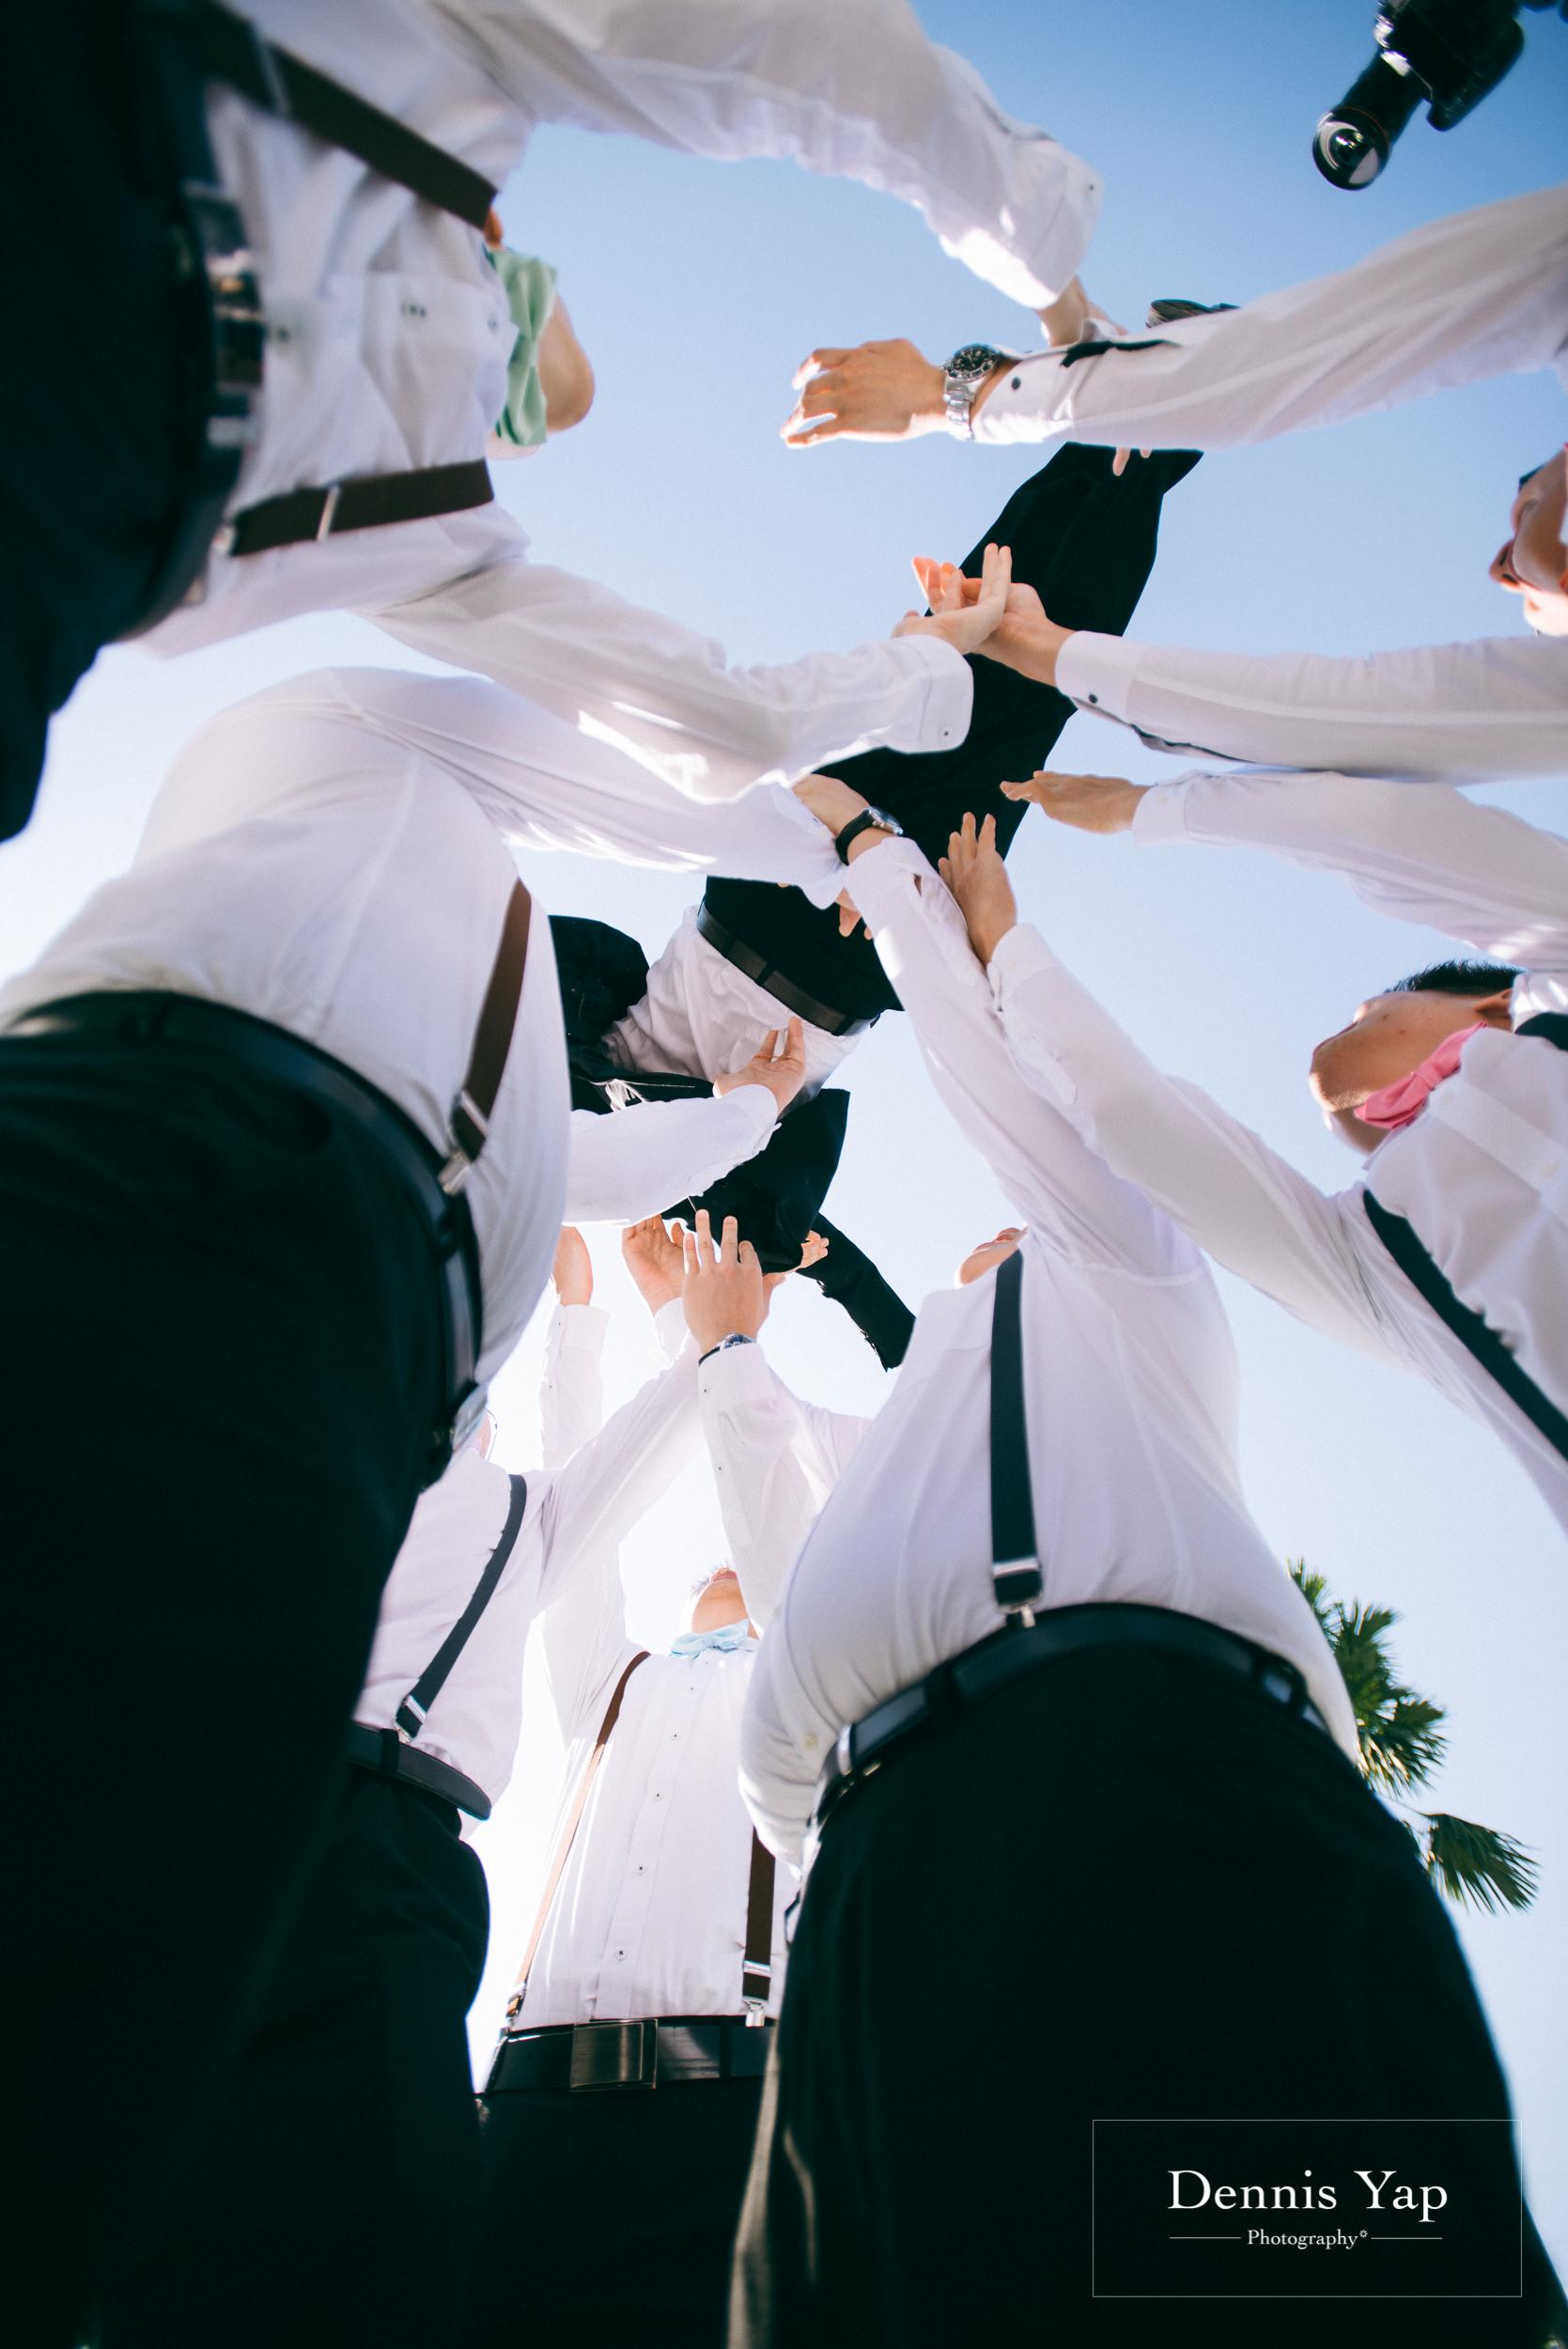 taylai cheng yee wedding day tropicana gold and country club damansara dennis yap photography-9.jpg